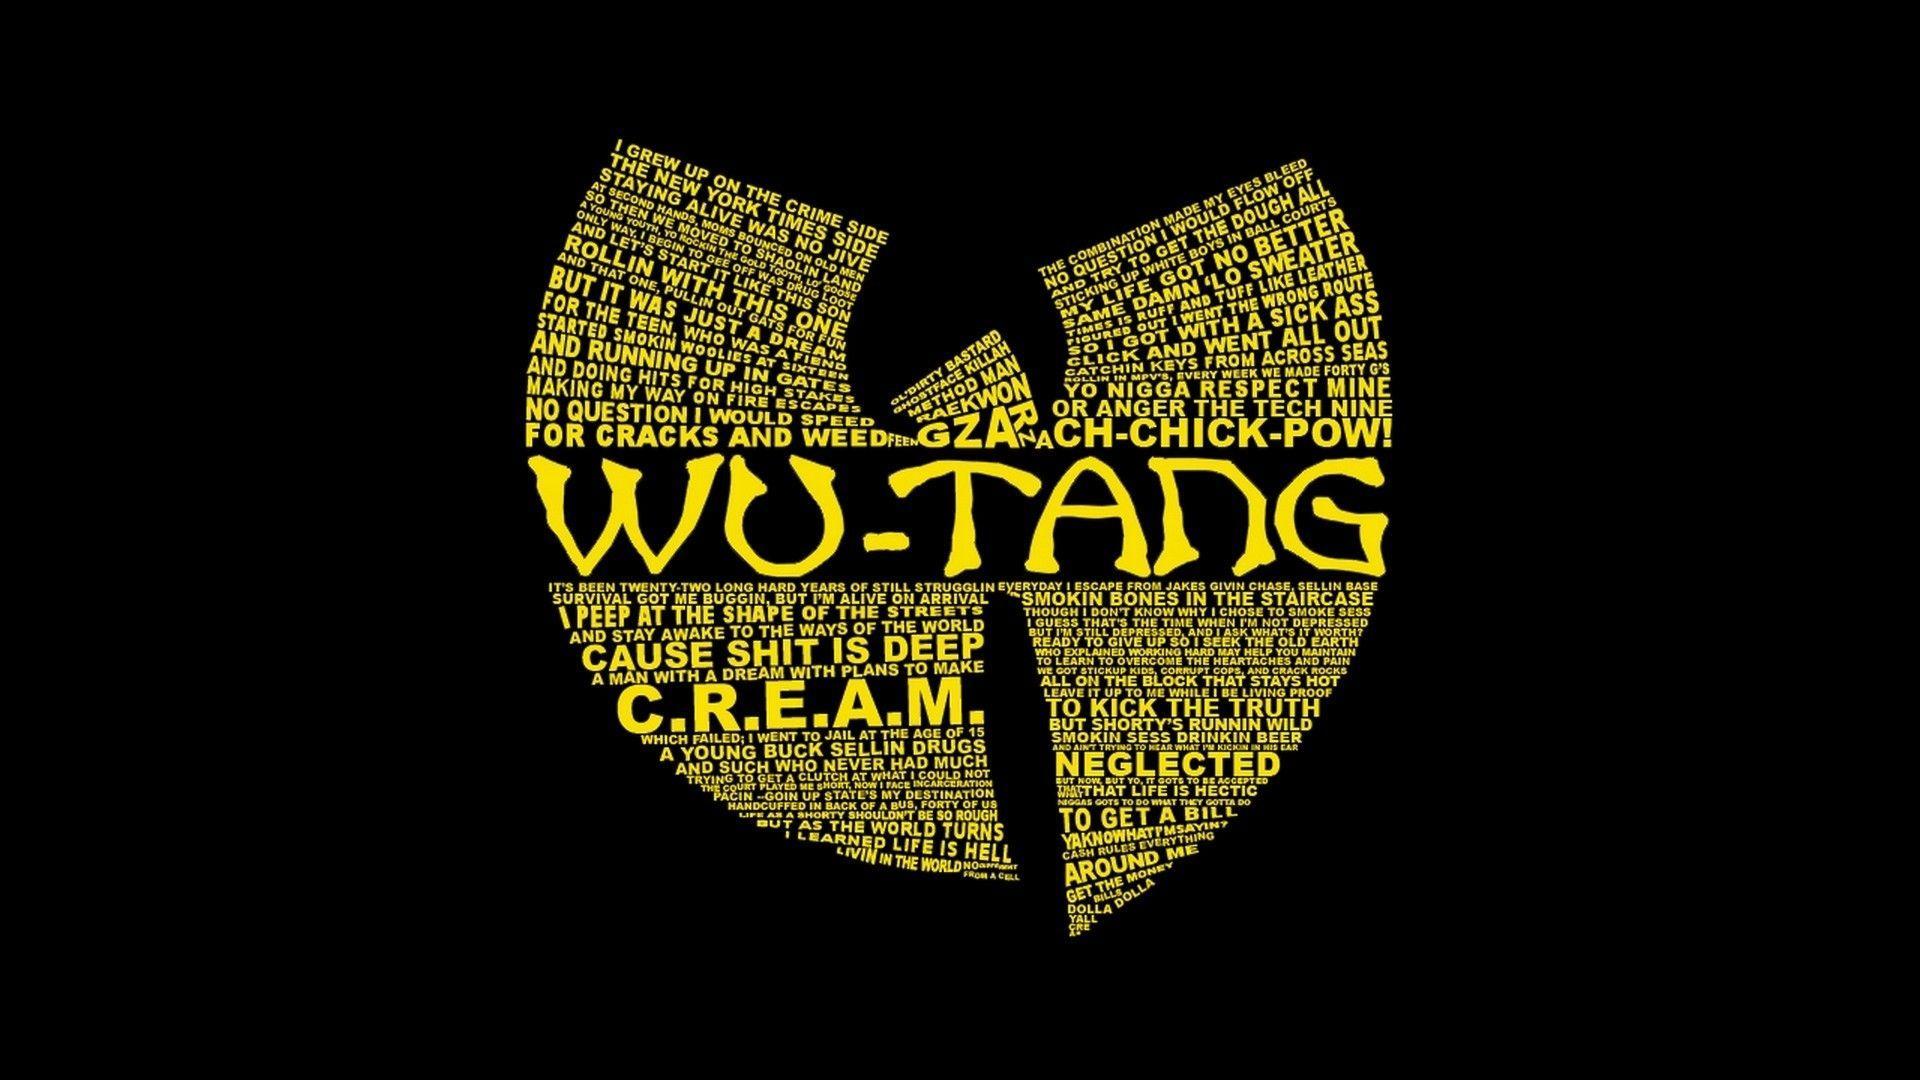 Rap Hip Hop Wallpapers - Top Free Rap Hip Hop Backgrounds